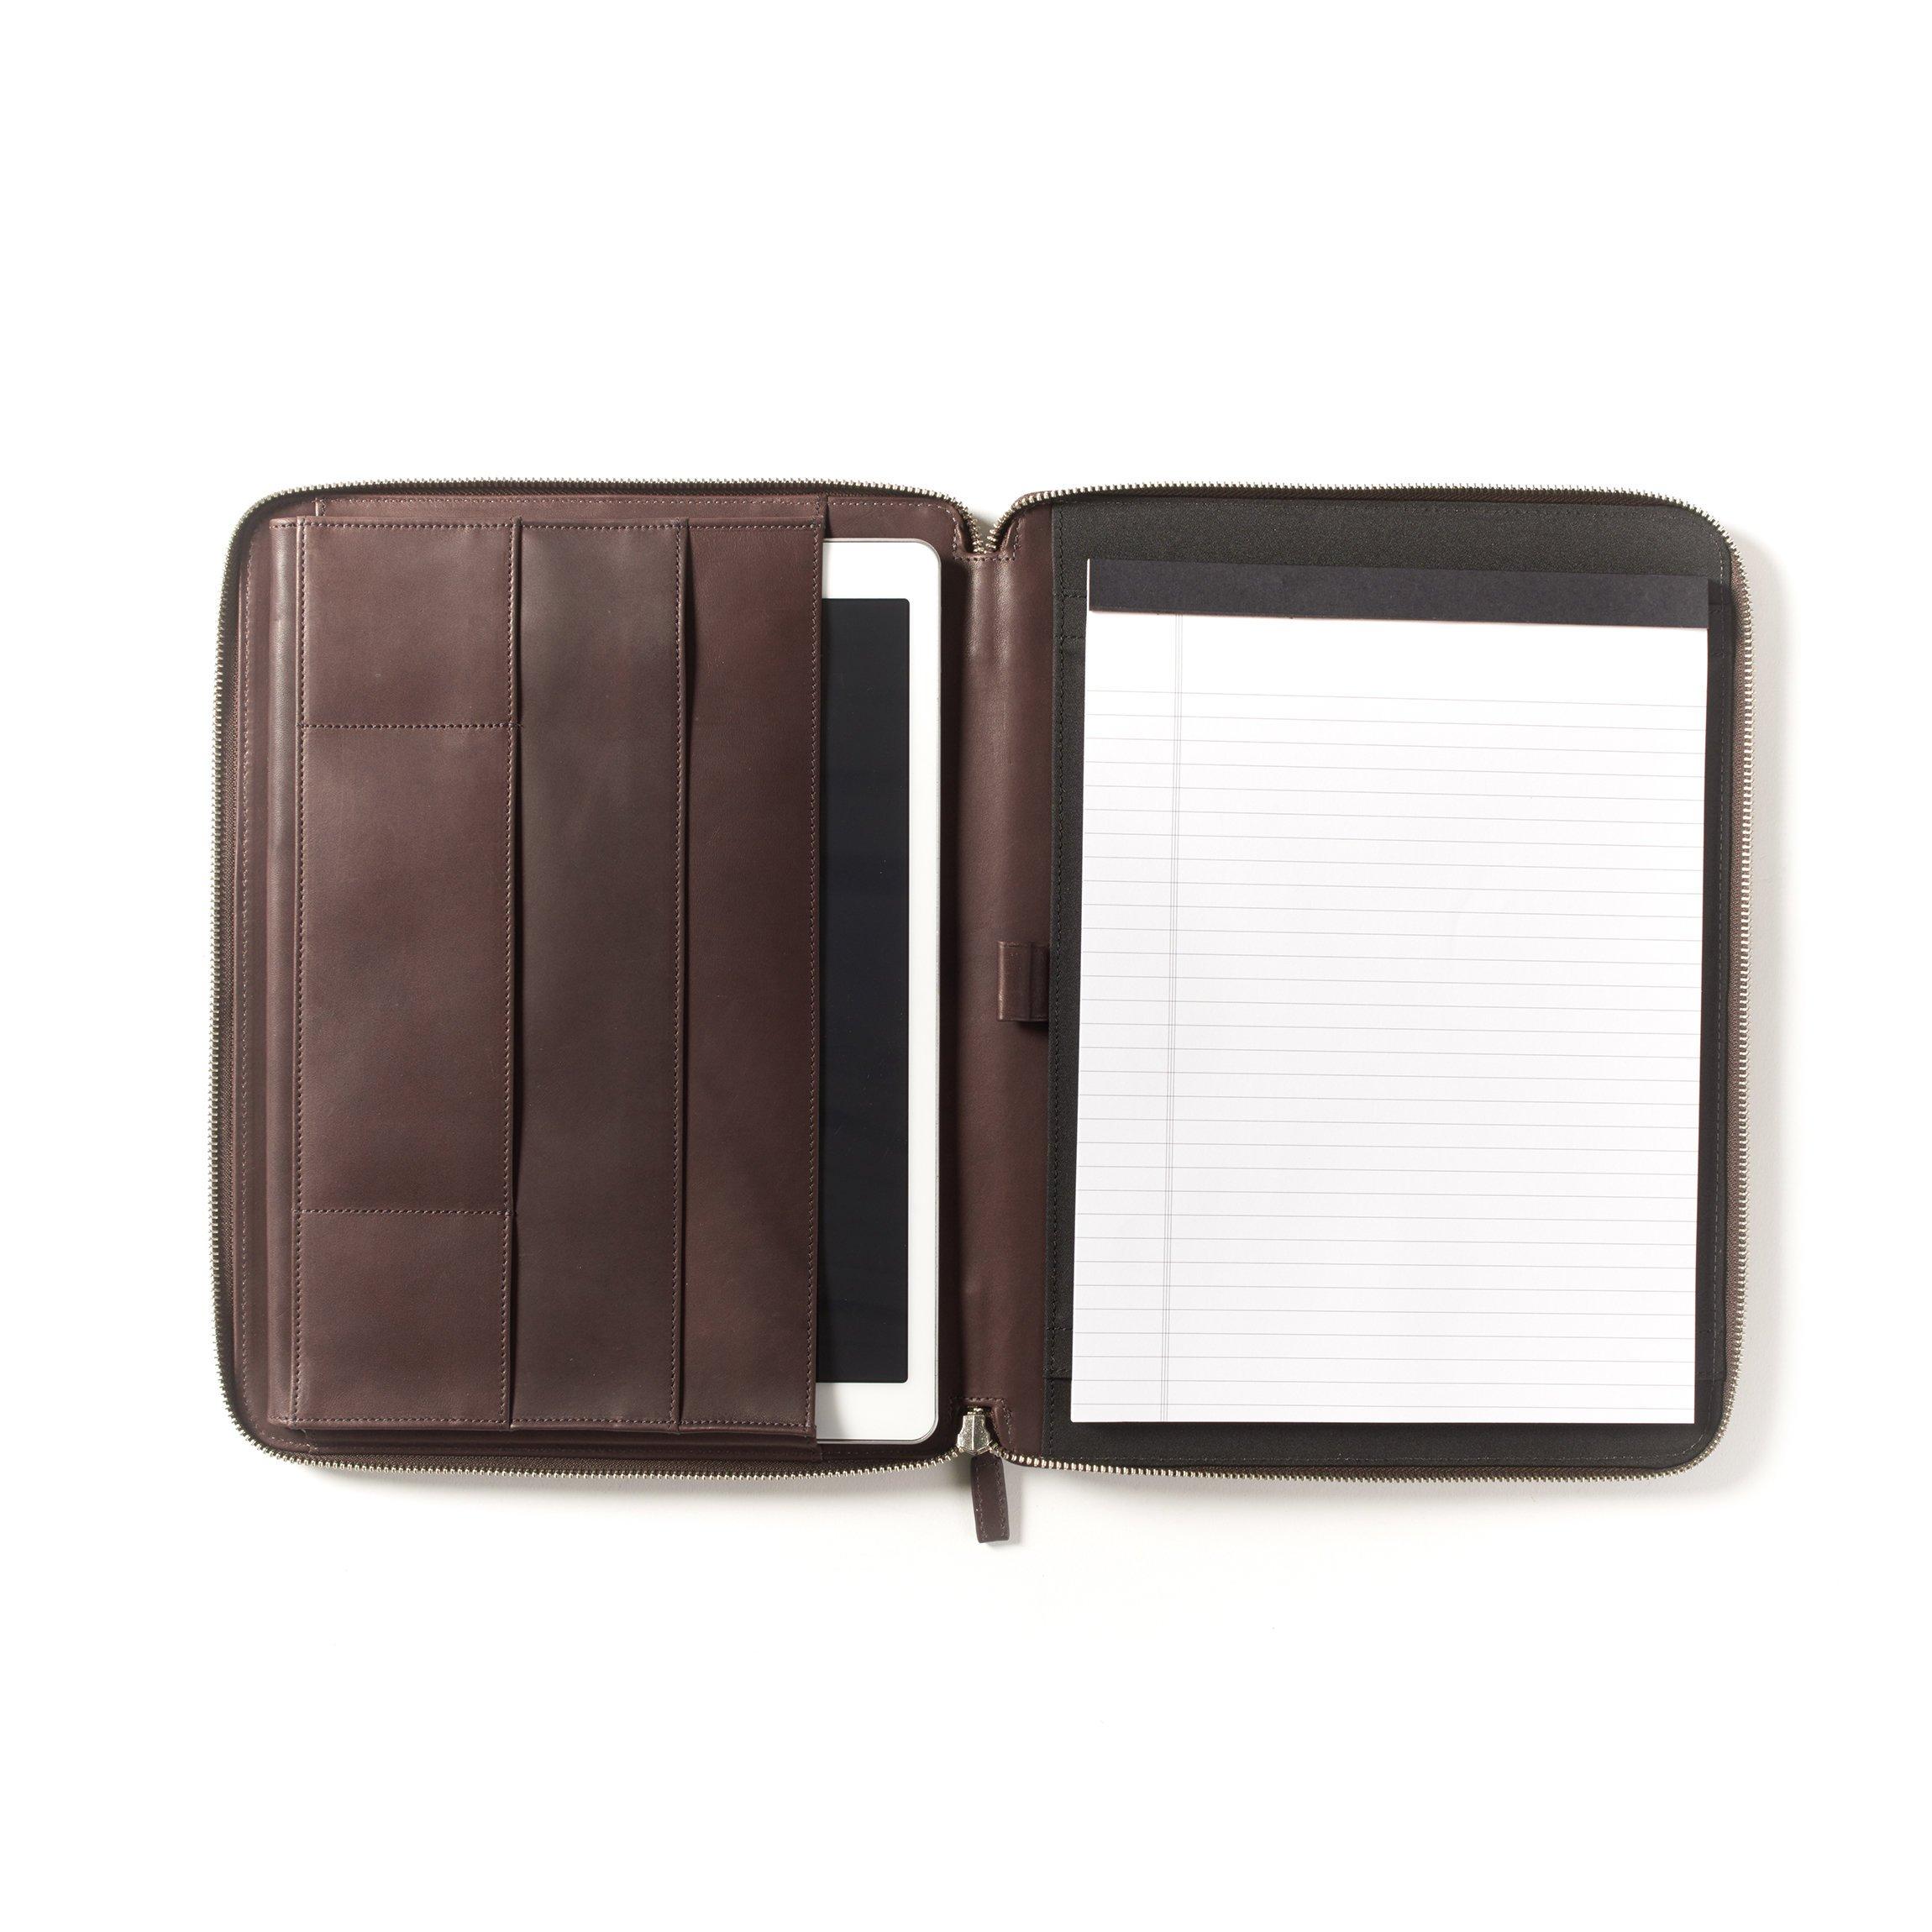 12.9 Inch Ipad Pro Portfolio - Full Grain German Leather Leather - Mahogany (brown)